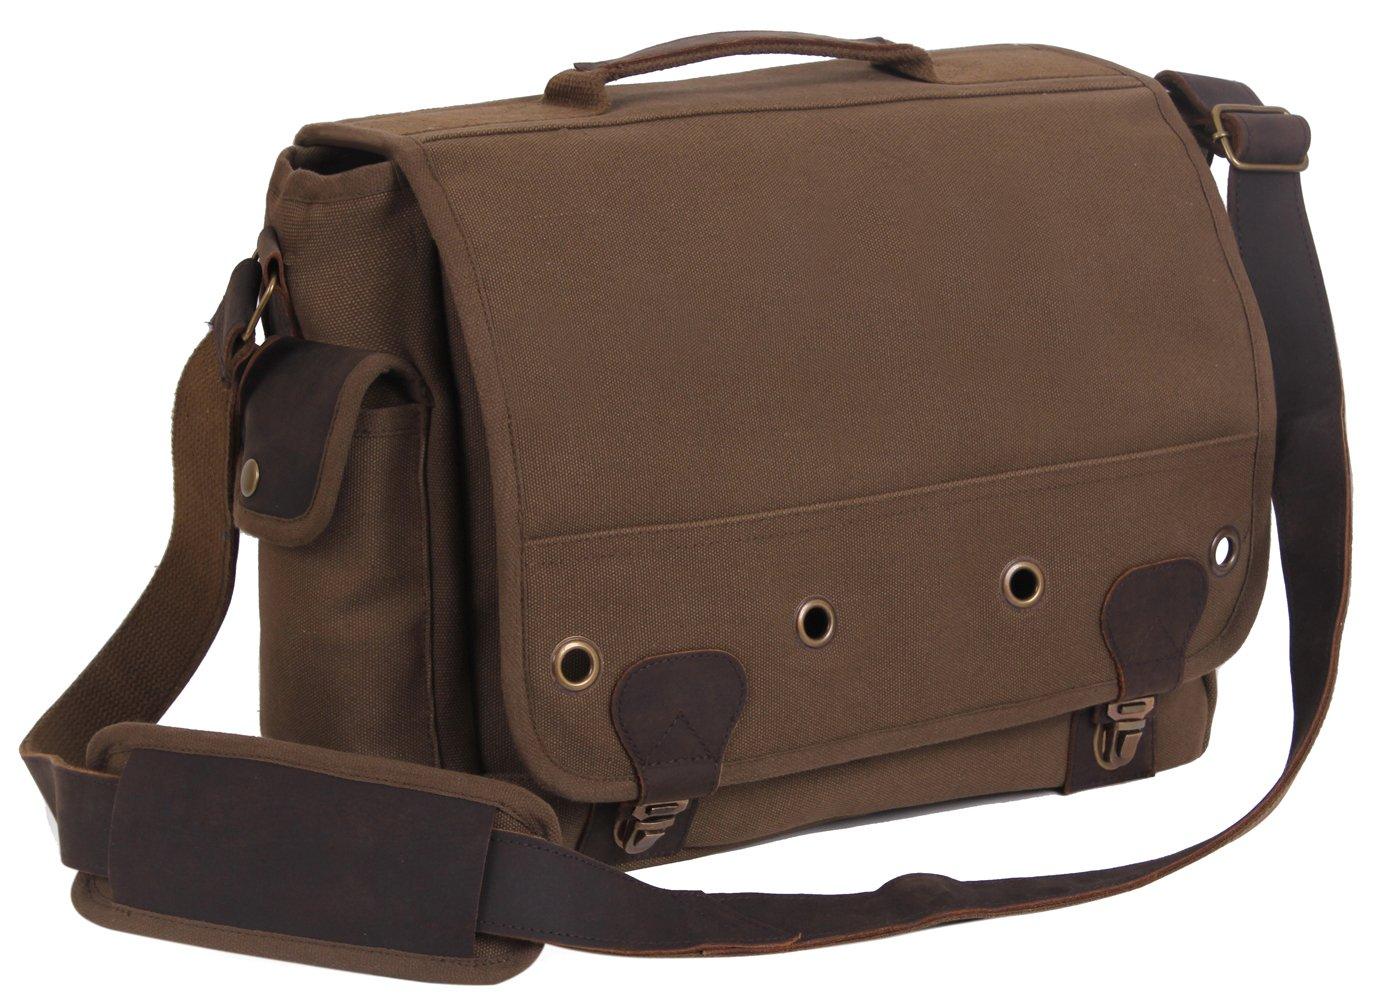 51cc8c8c288c Amazon.com: Rothco Canvas Trailblazer Laptop Bag, Earth Brown ...